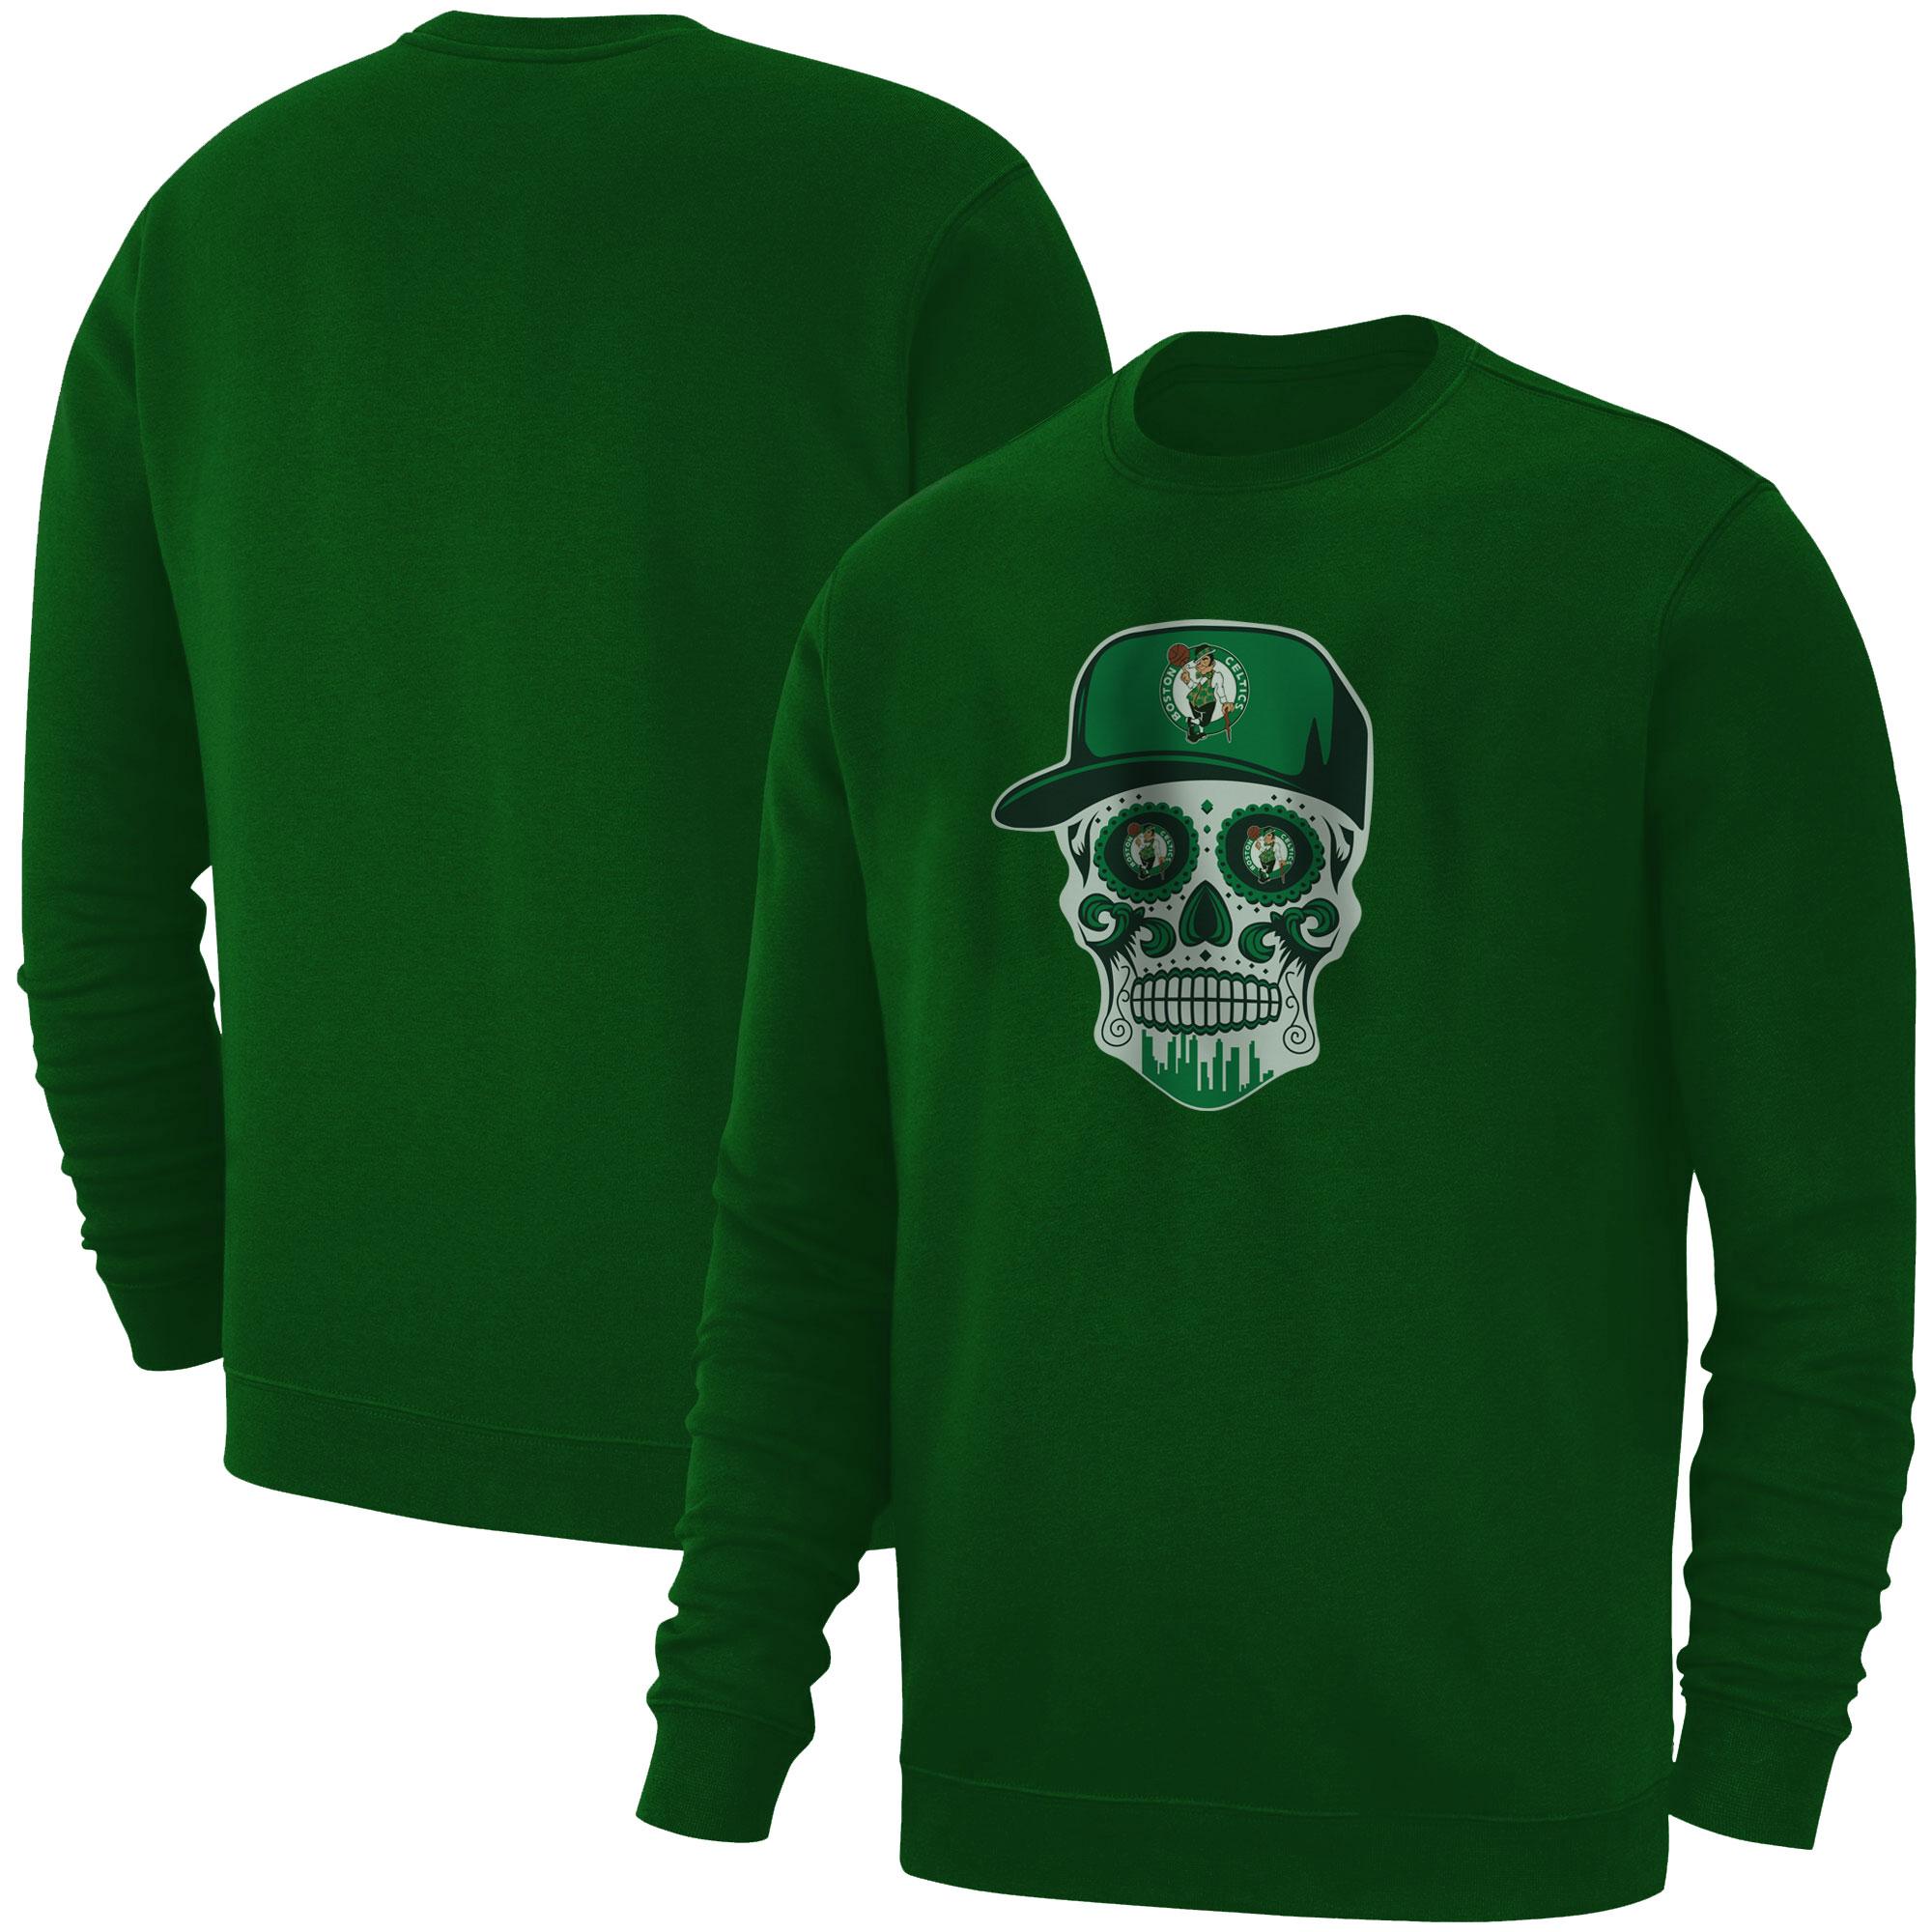 Celtics Skull  Basic (BSC-GRY-NP-448-NBA-BSTN-SKULL)